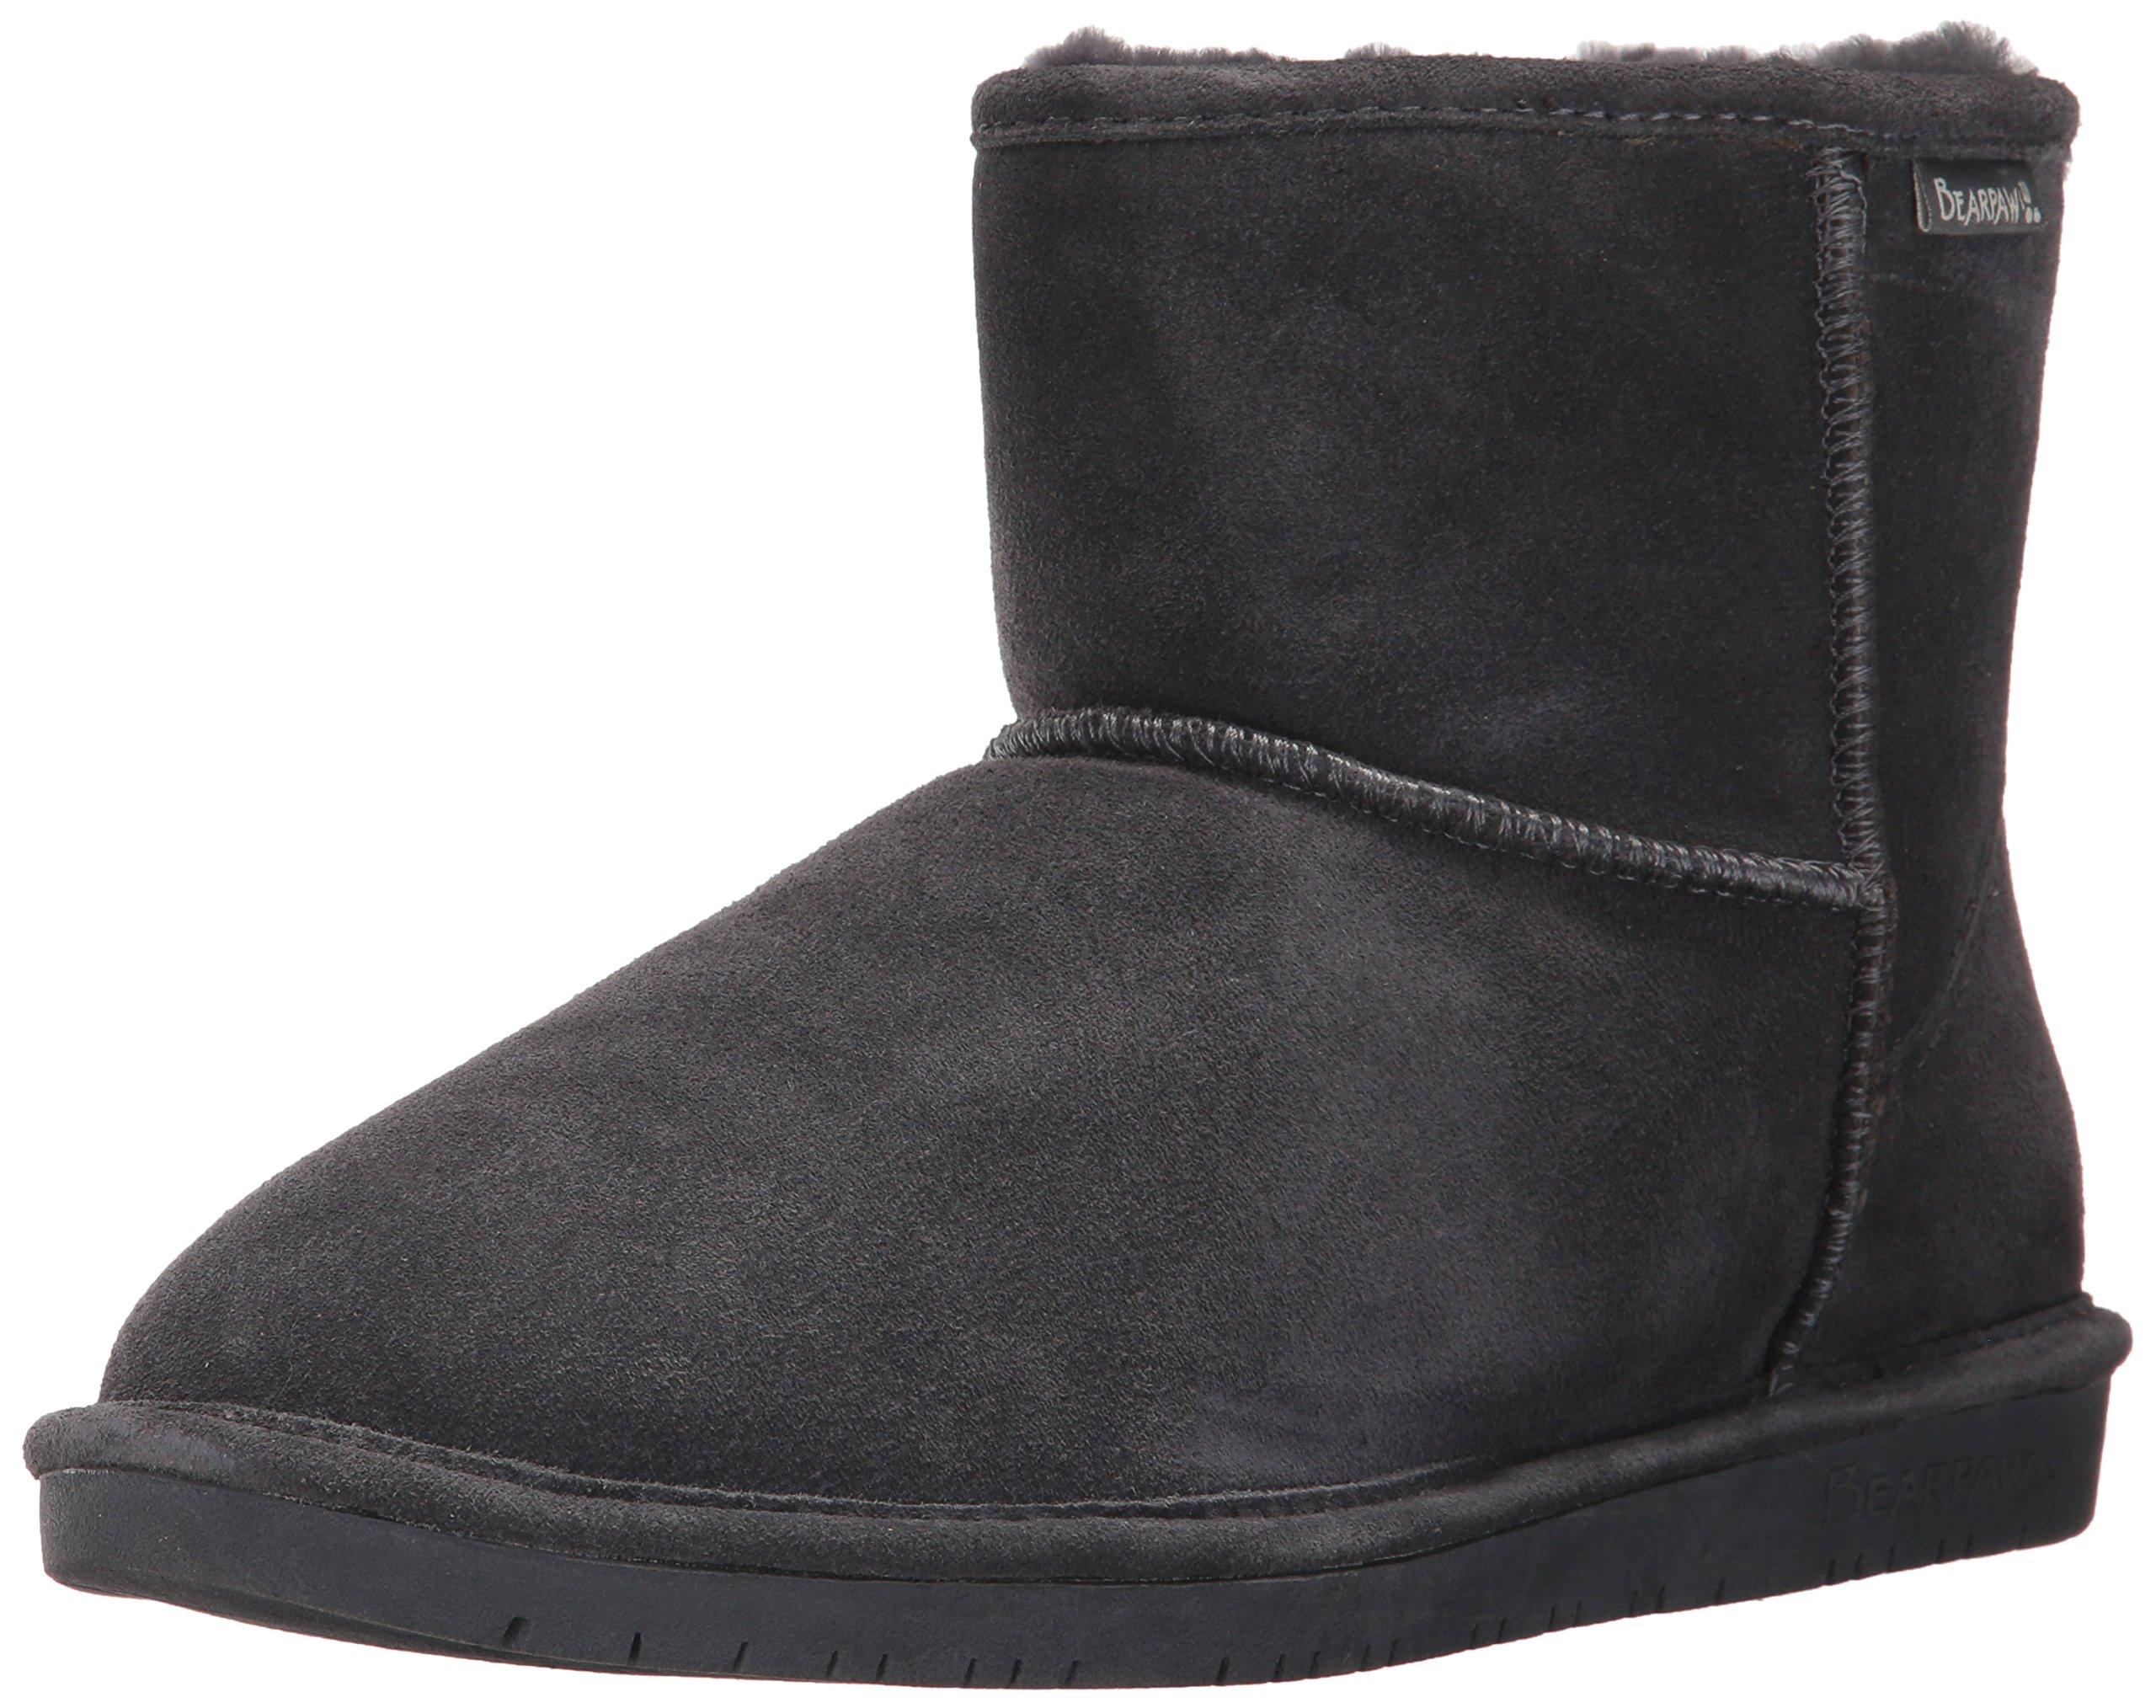 BEARPAW Women's Demi Fashion Boot, Charcoal, 12 Medium US